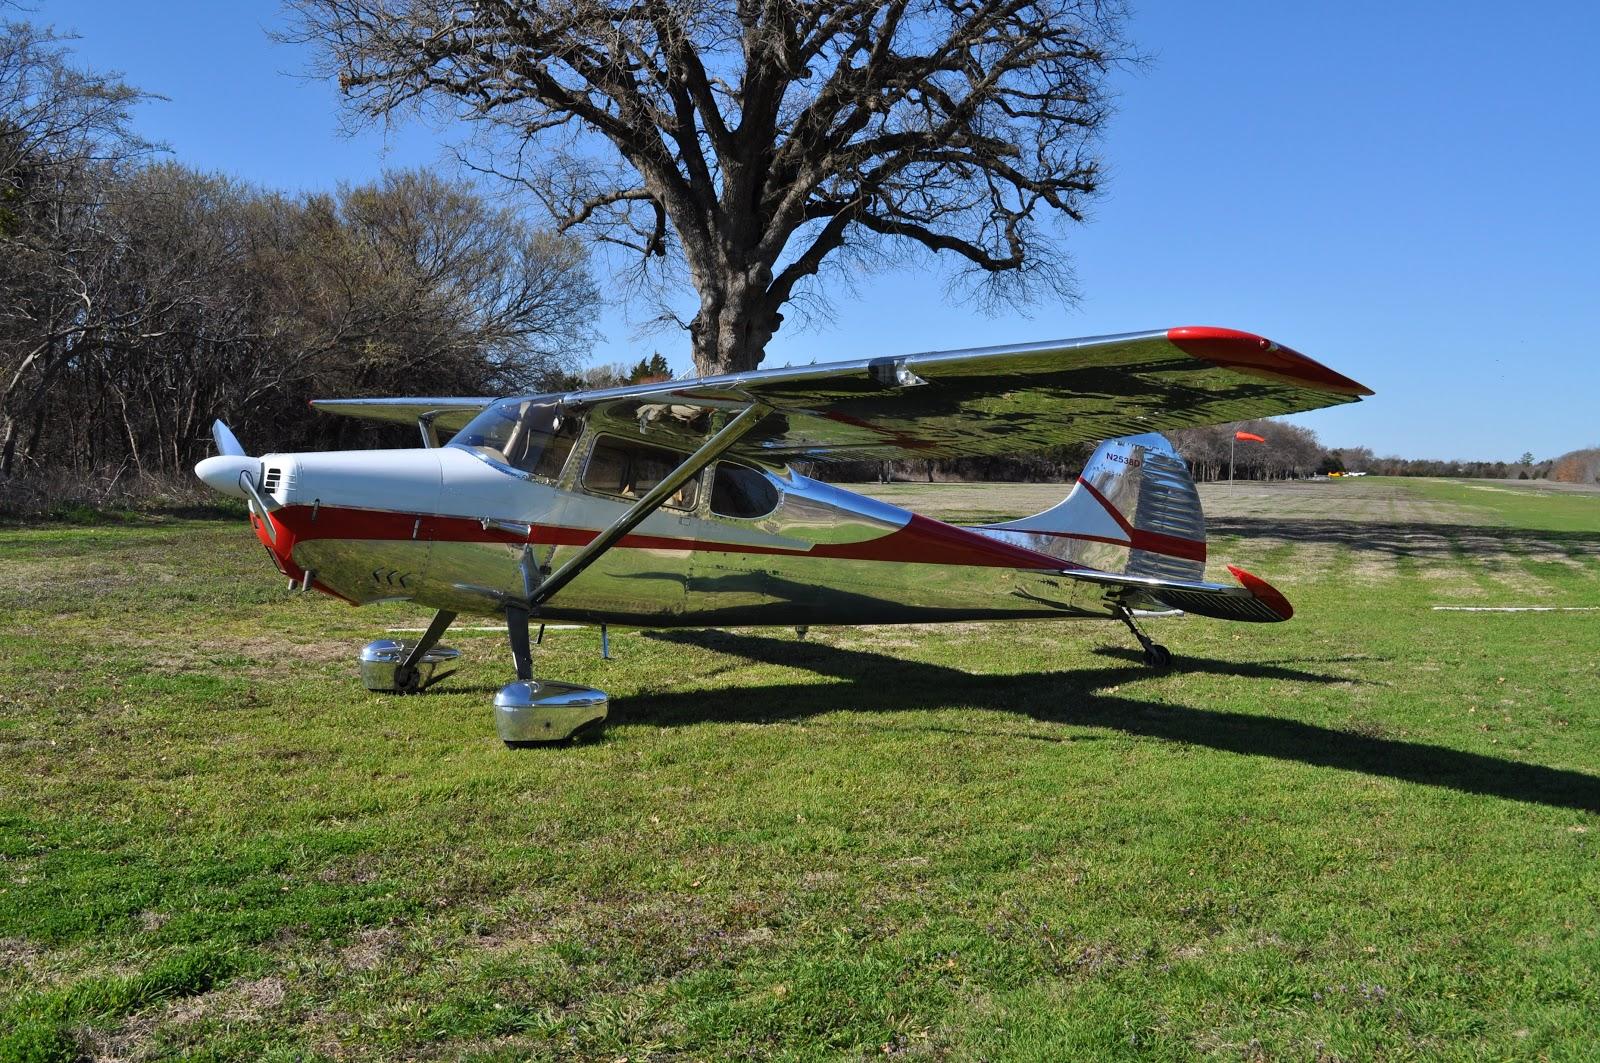 Cessna N2538d